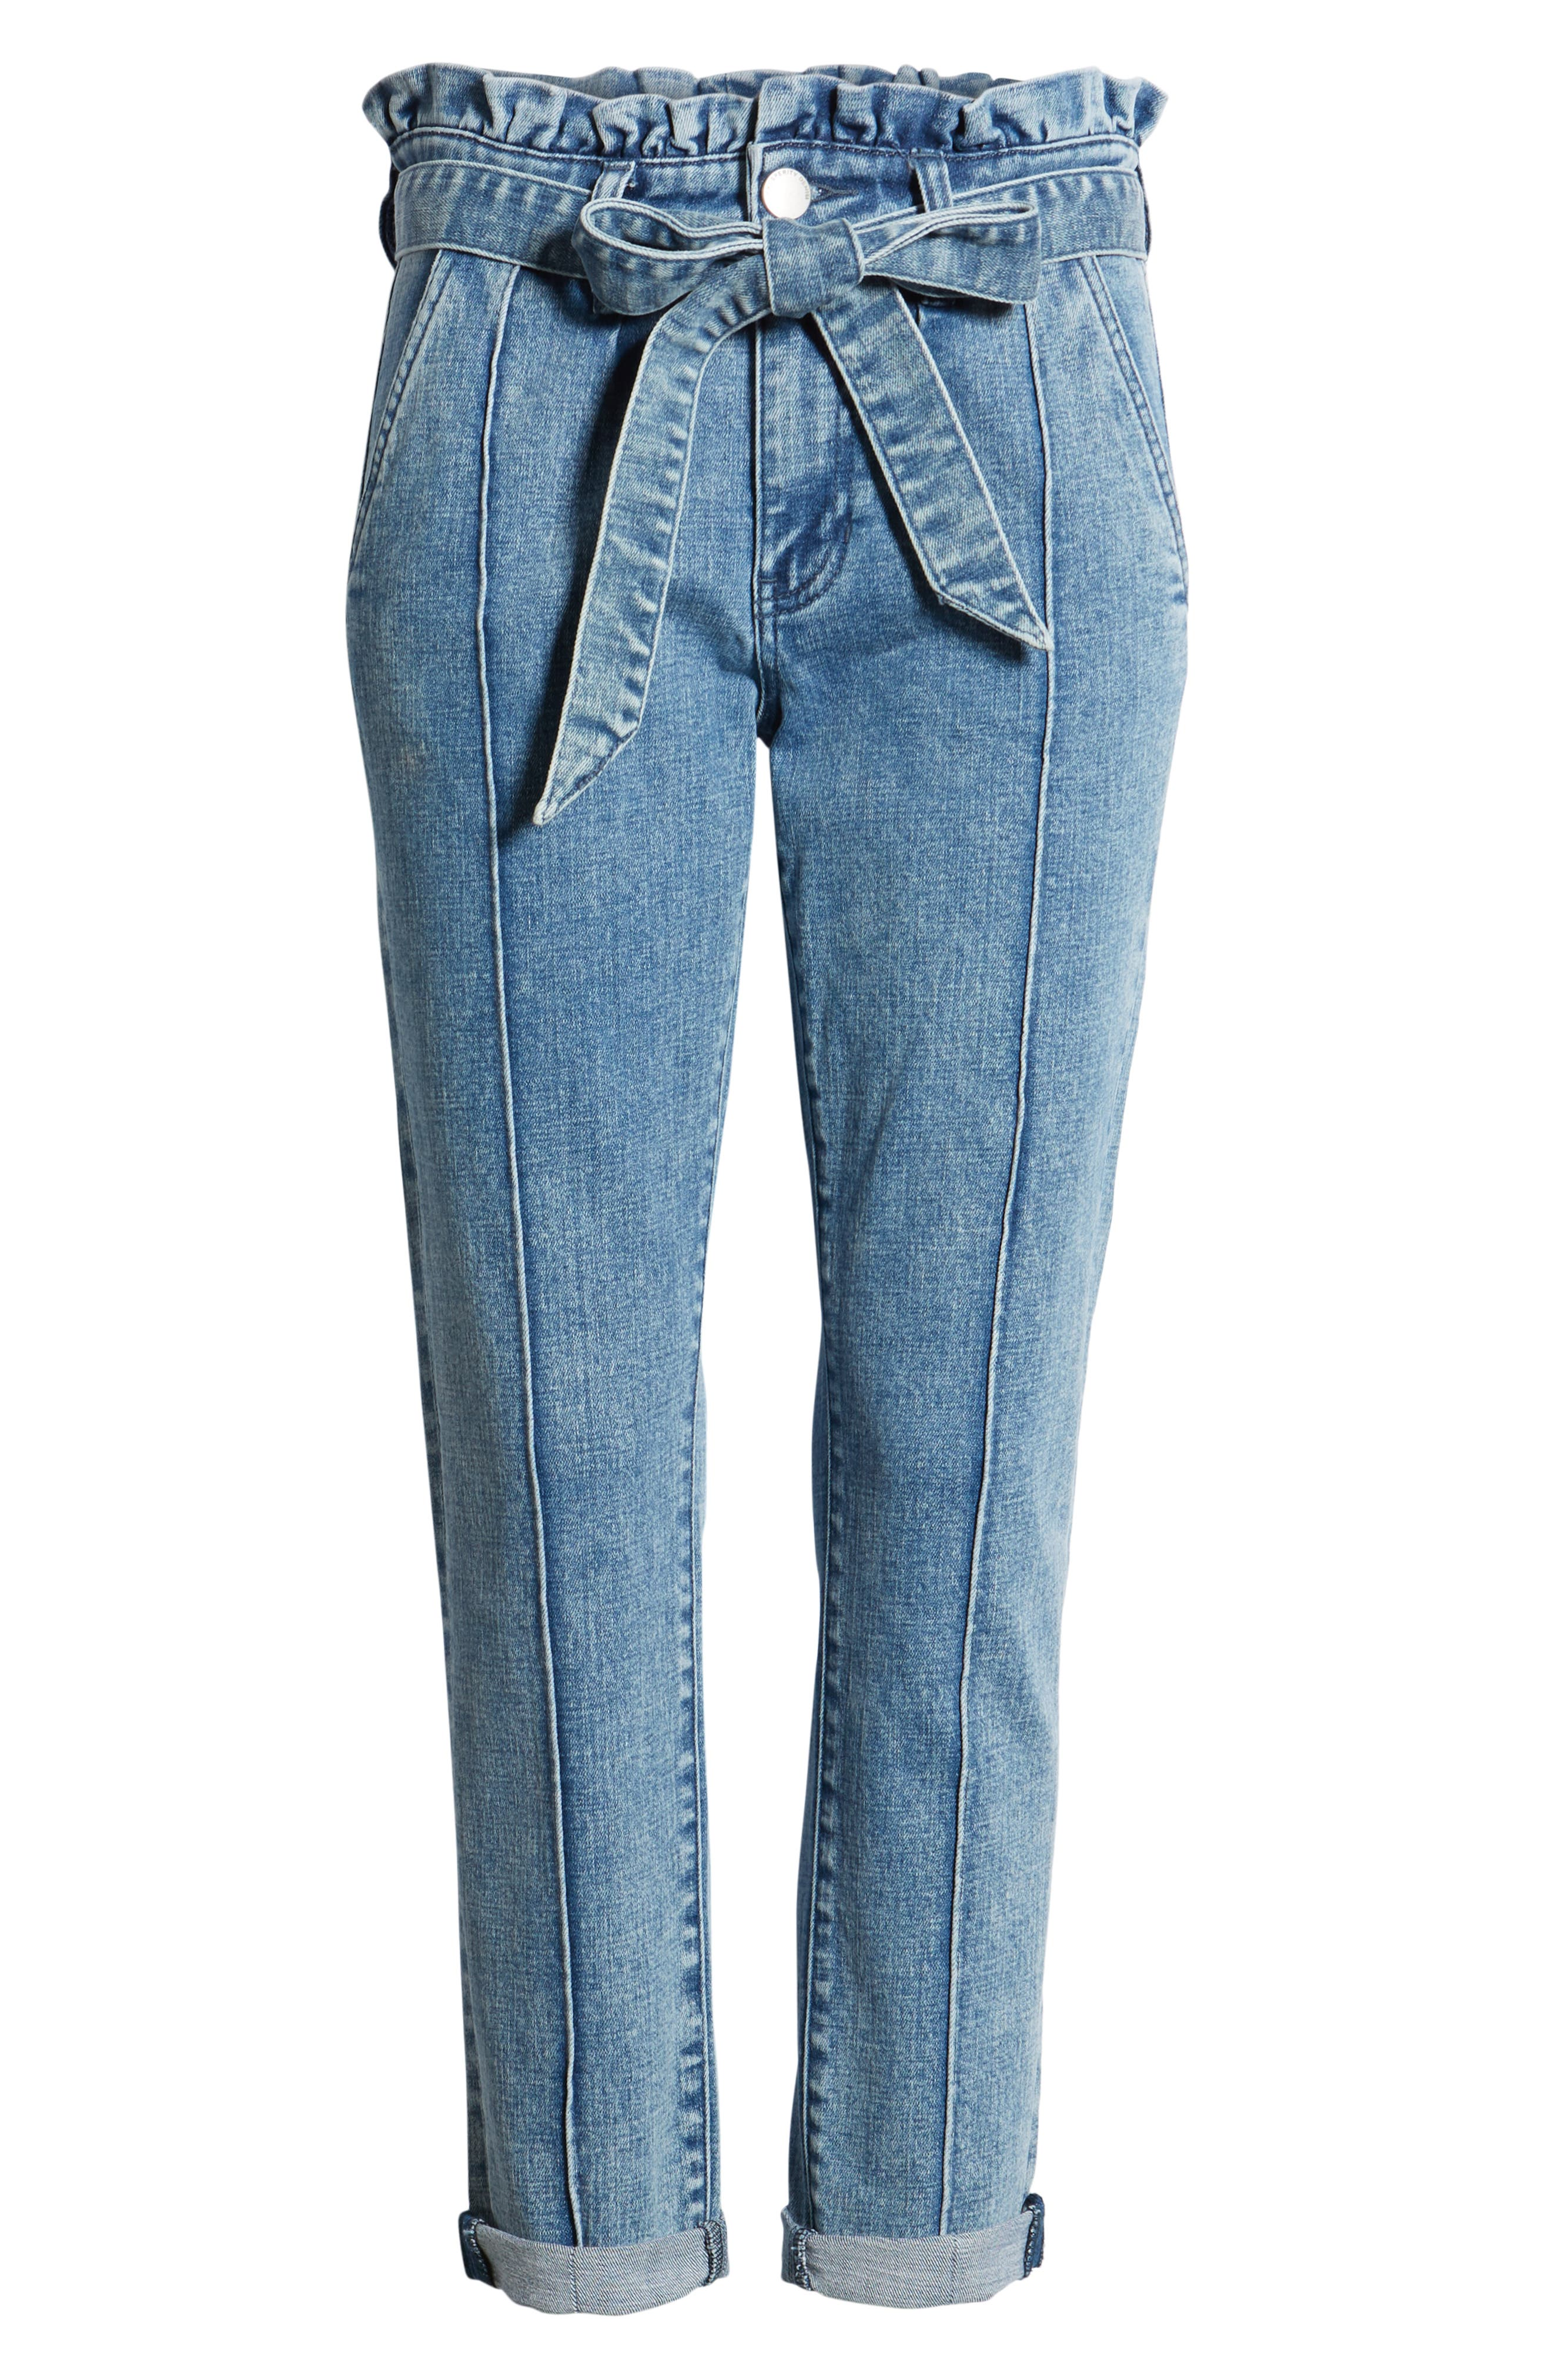 PROSPERITY DENIM, Paperbag Waist Crop Skinny Jeans, Alternate thumbnail 7, color, MEDIUM LIGHT WASH